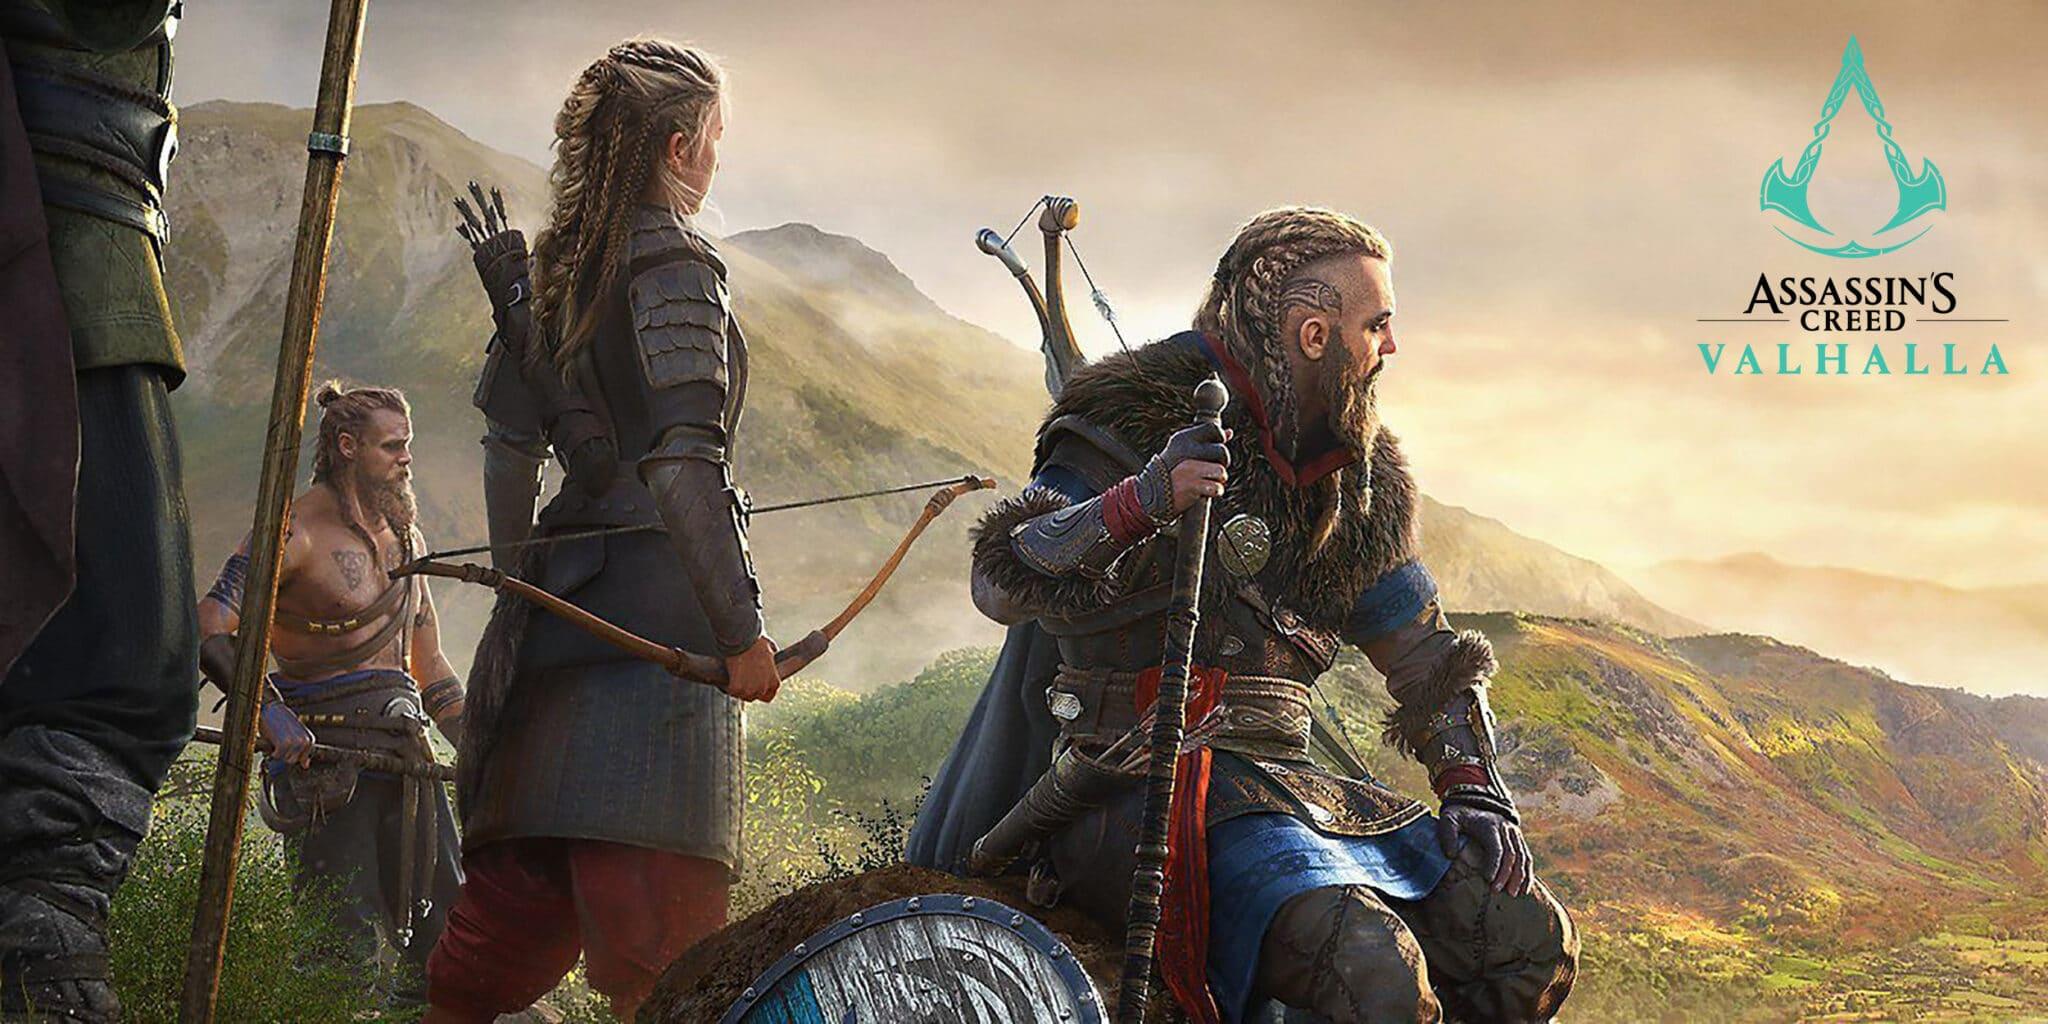 Assassin's Creed: Valhalla – How to Unlock Explosive Arrows